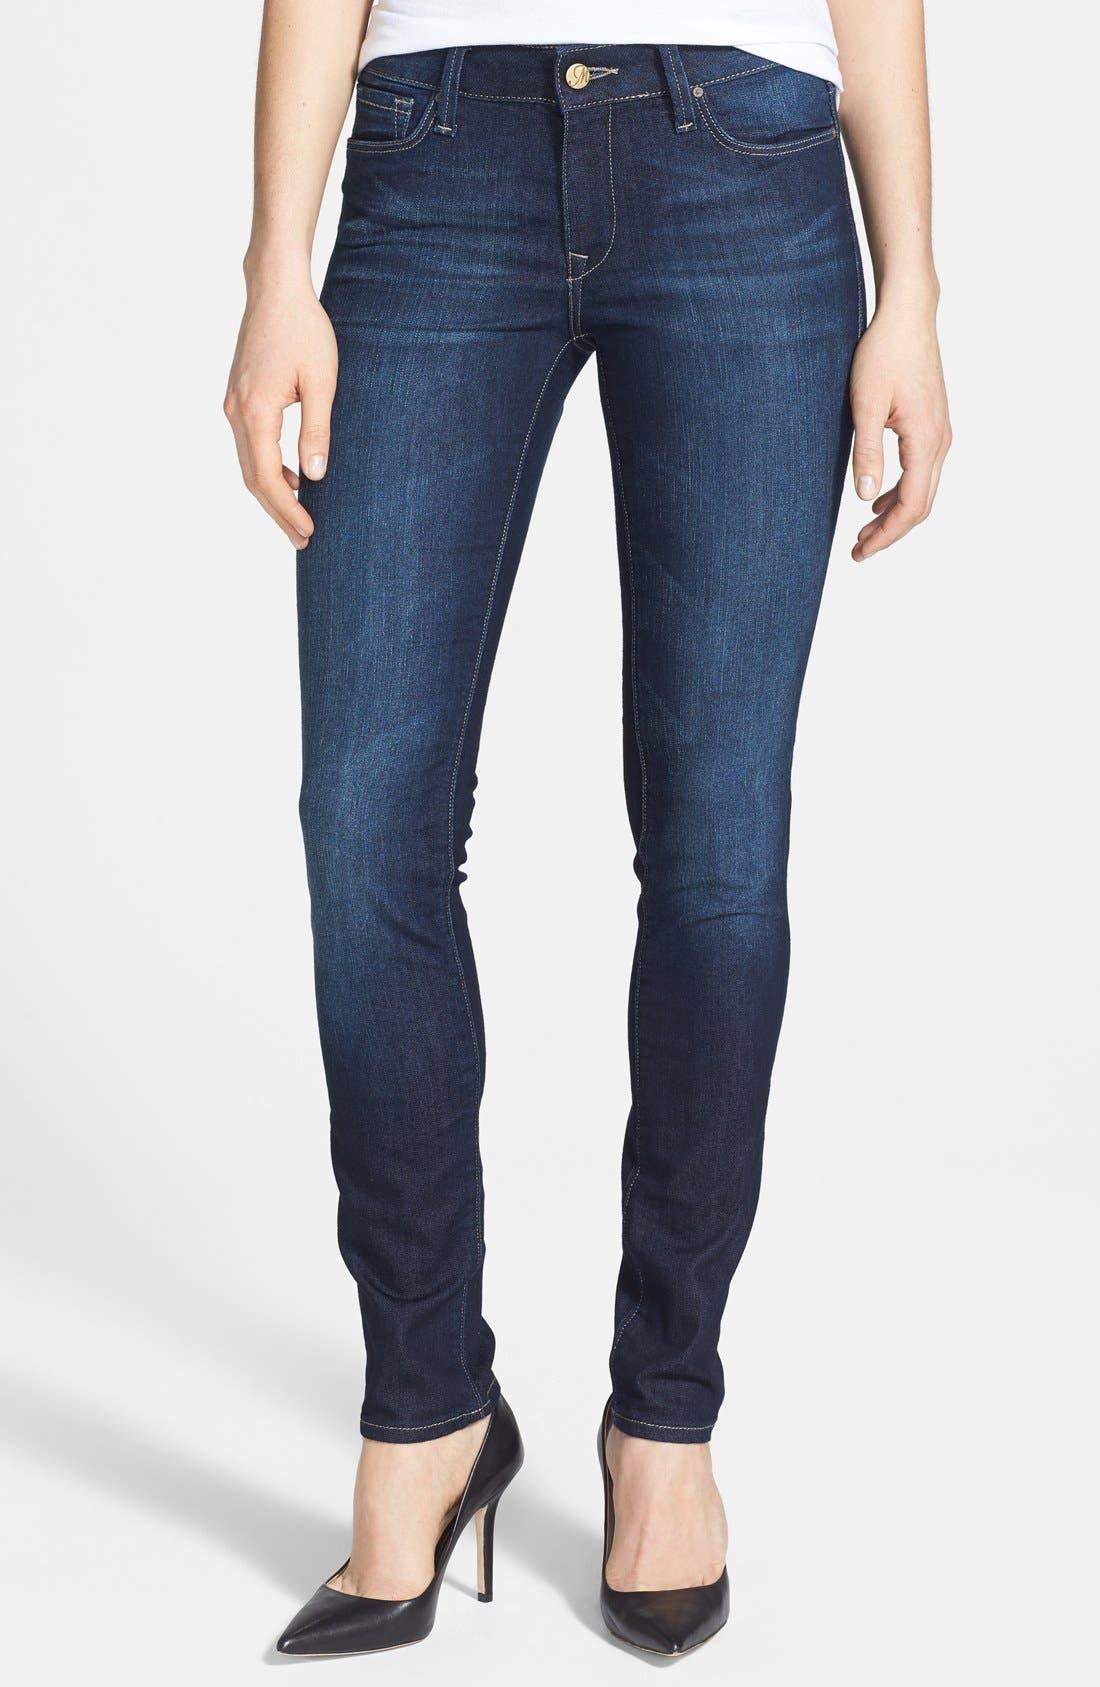 Alternate Image 1 Selected - Mavi Jeans 'Adriana' Skinny Jeans (Deep Nolita)